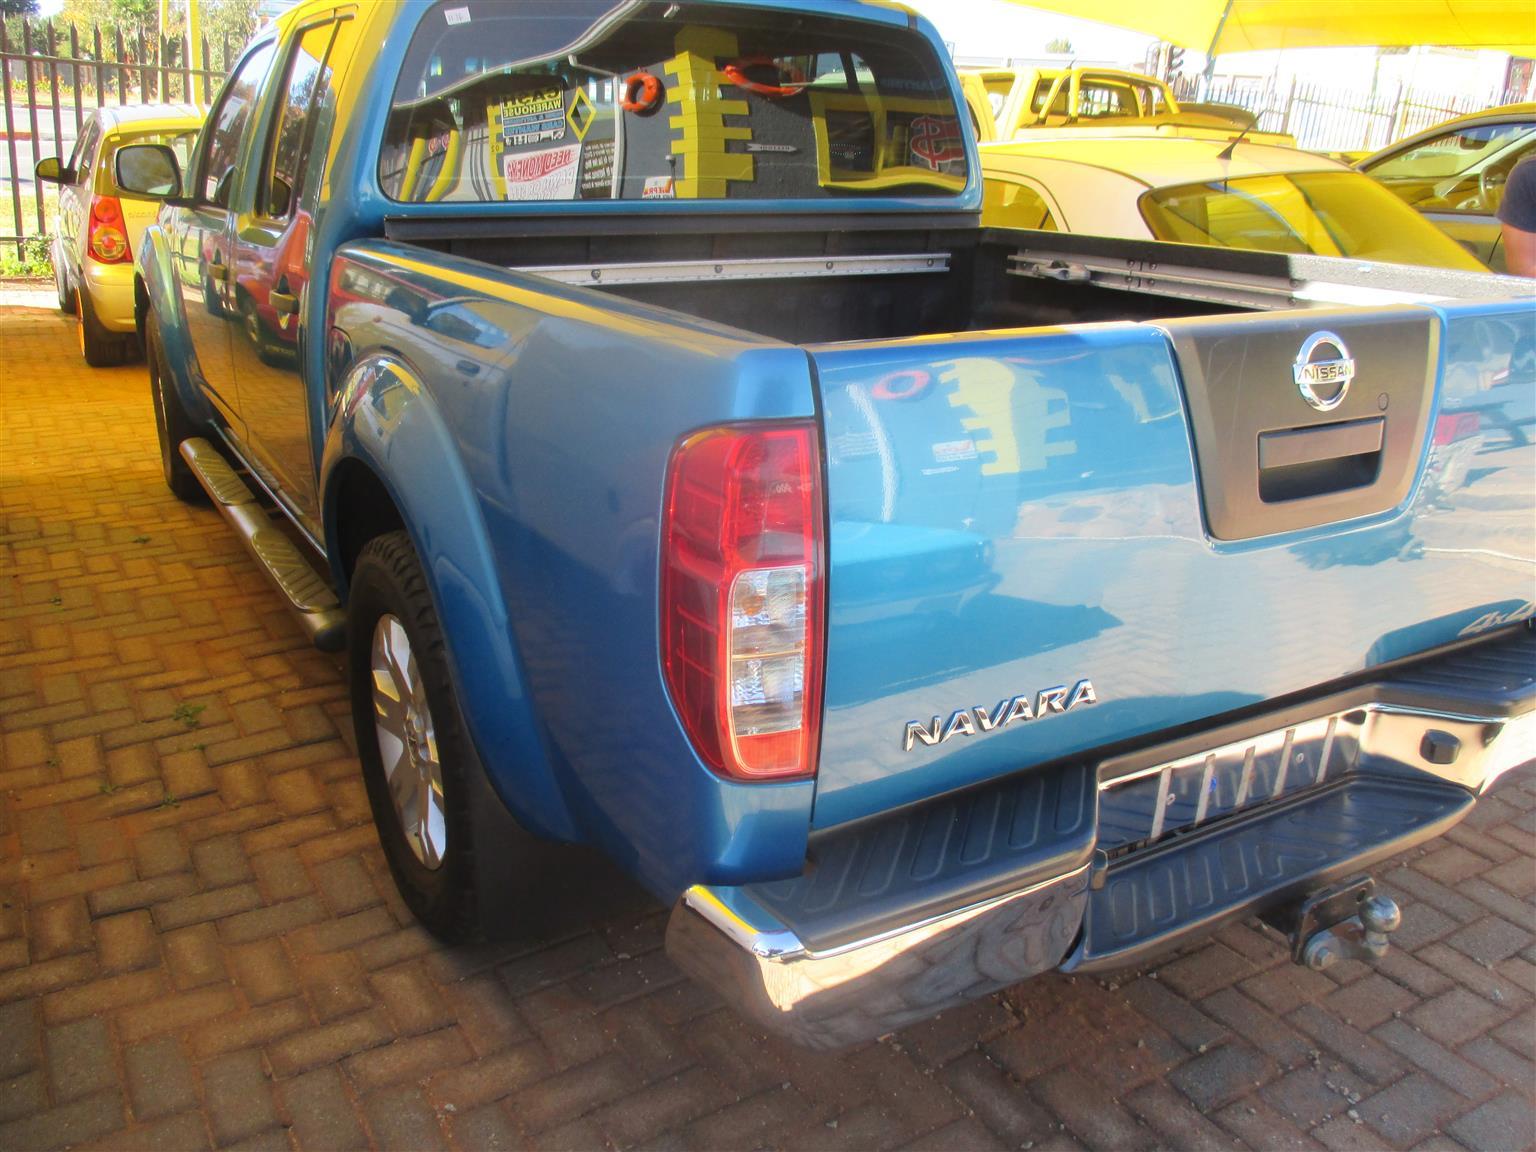 2006 Nissan Navara 2.5dCi 4x4